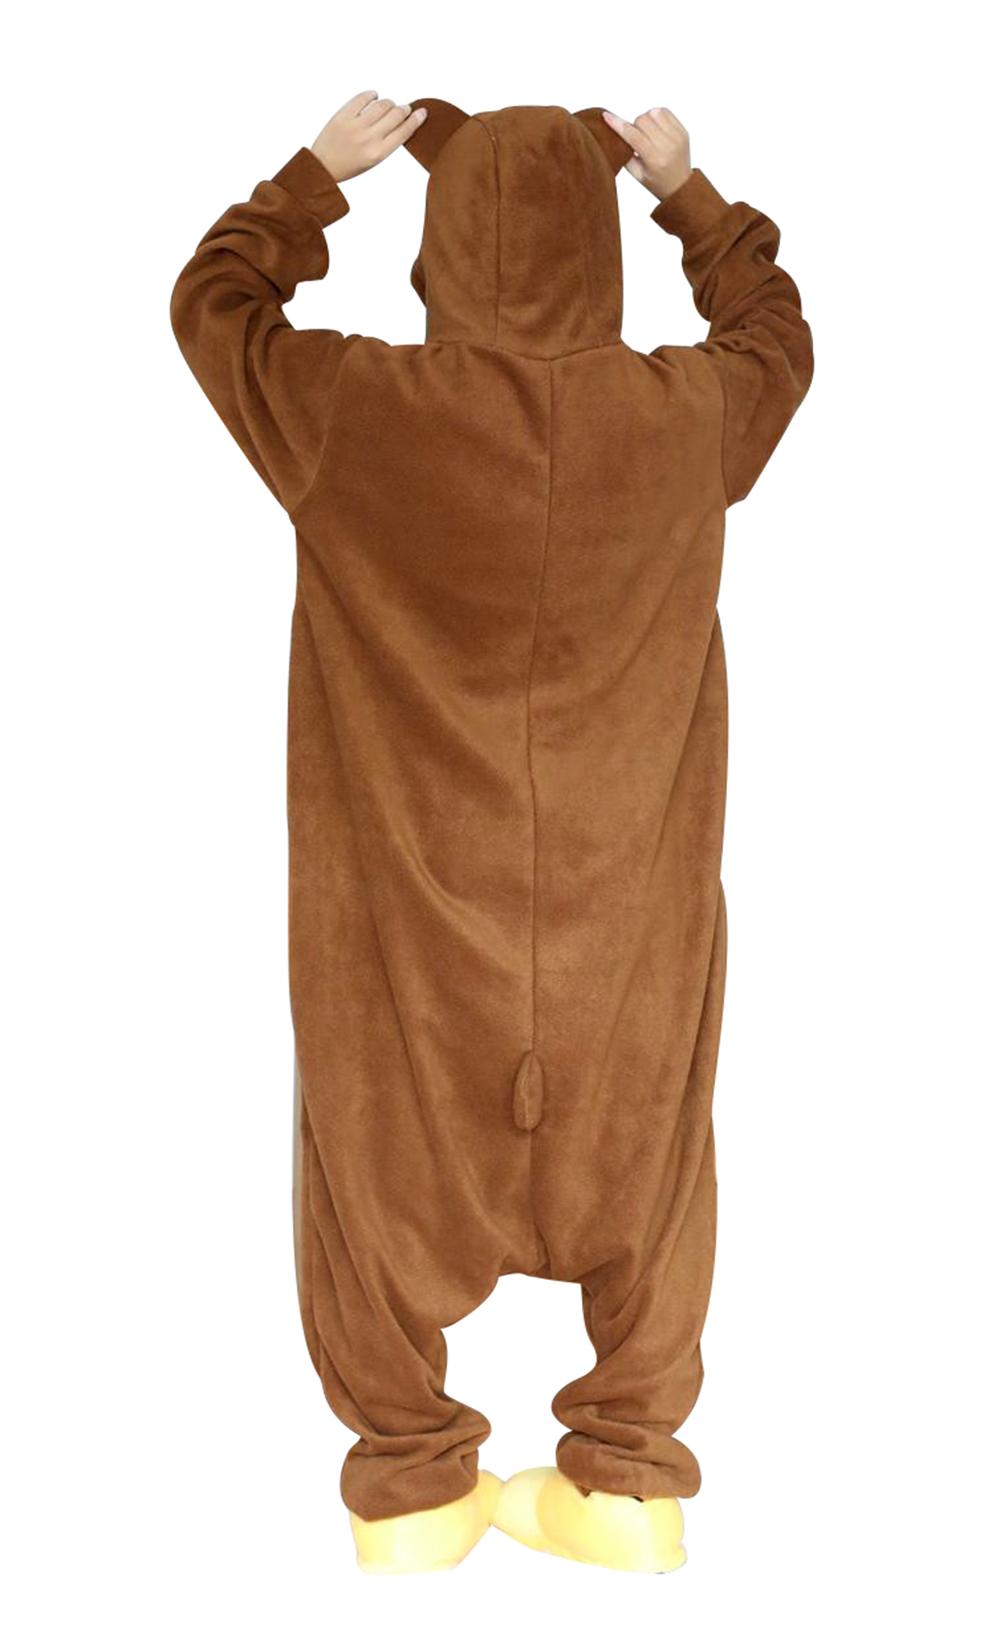 Brown Bear02